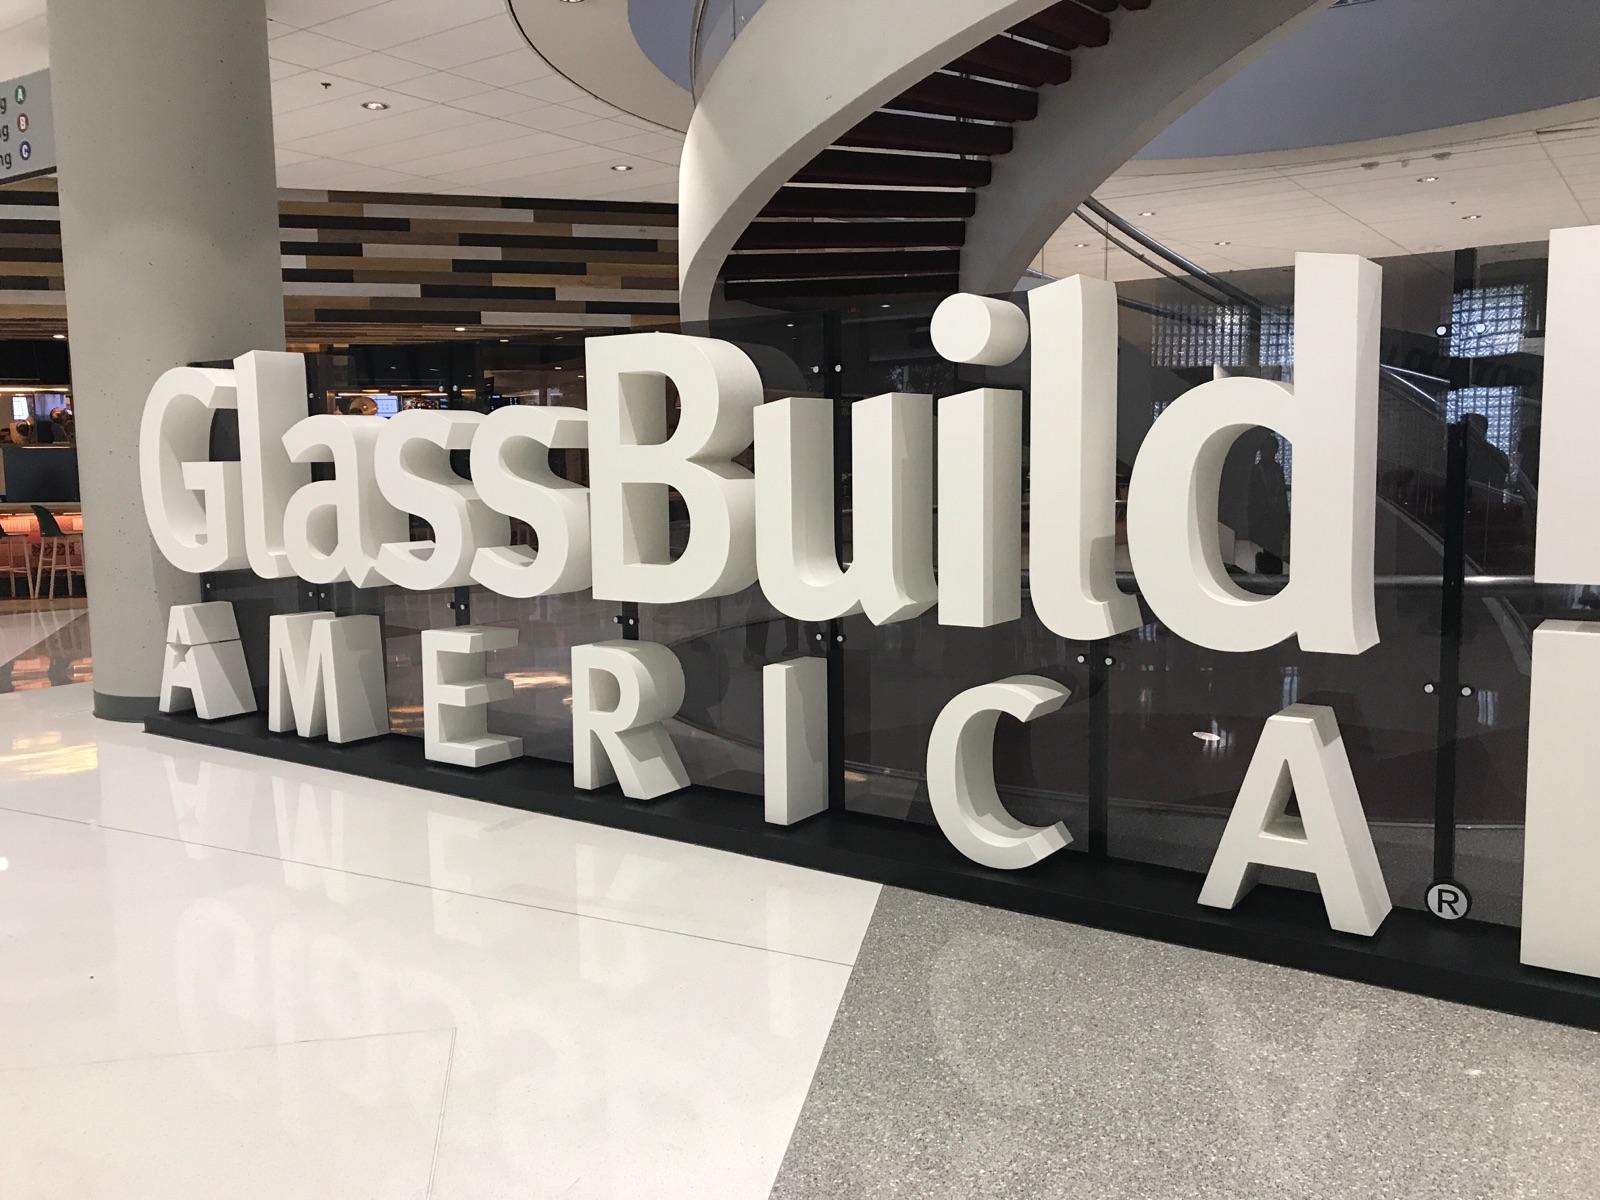 At GlassBuild America 2017